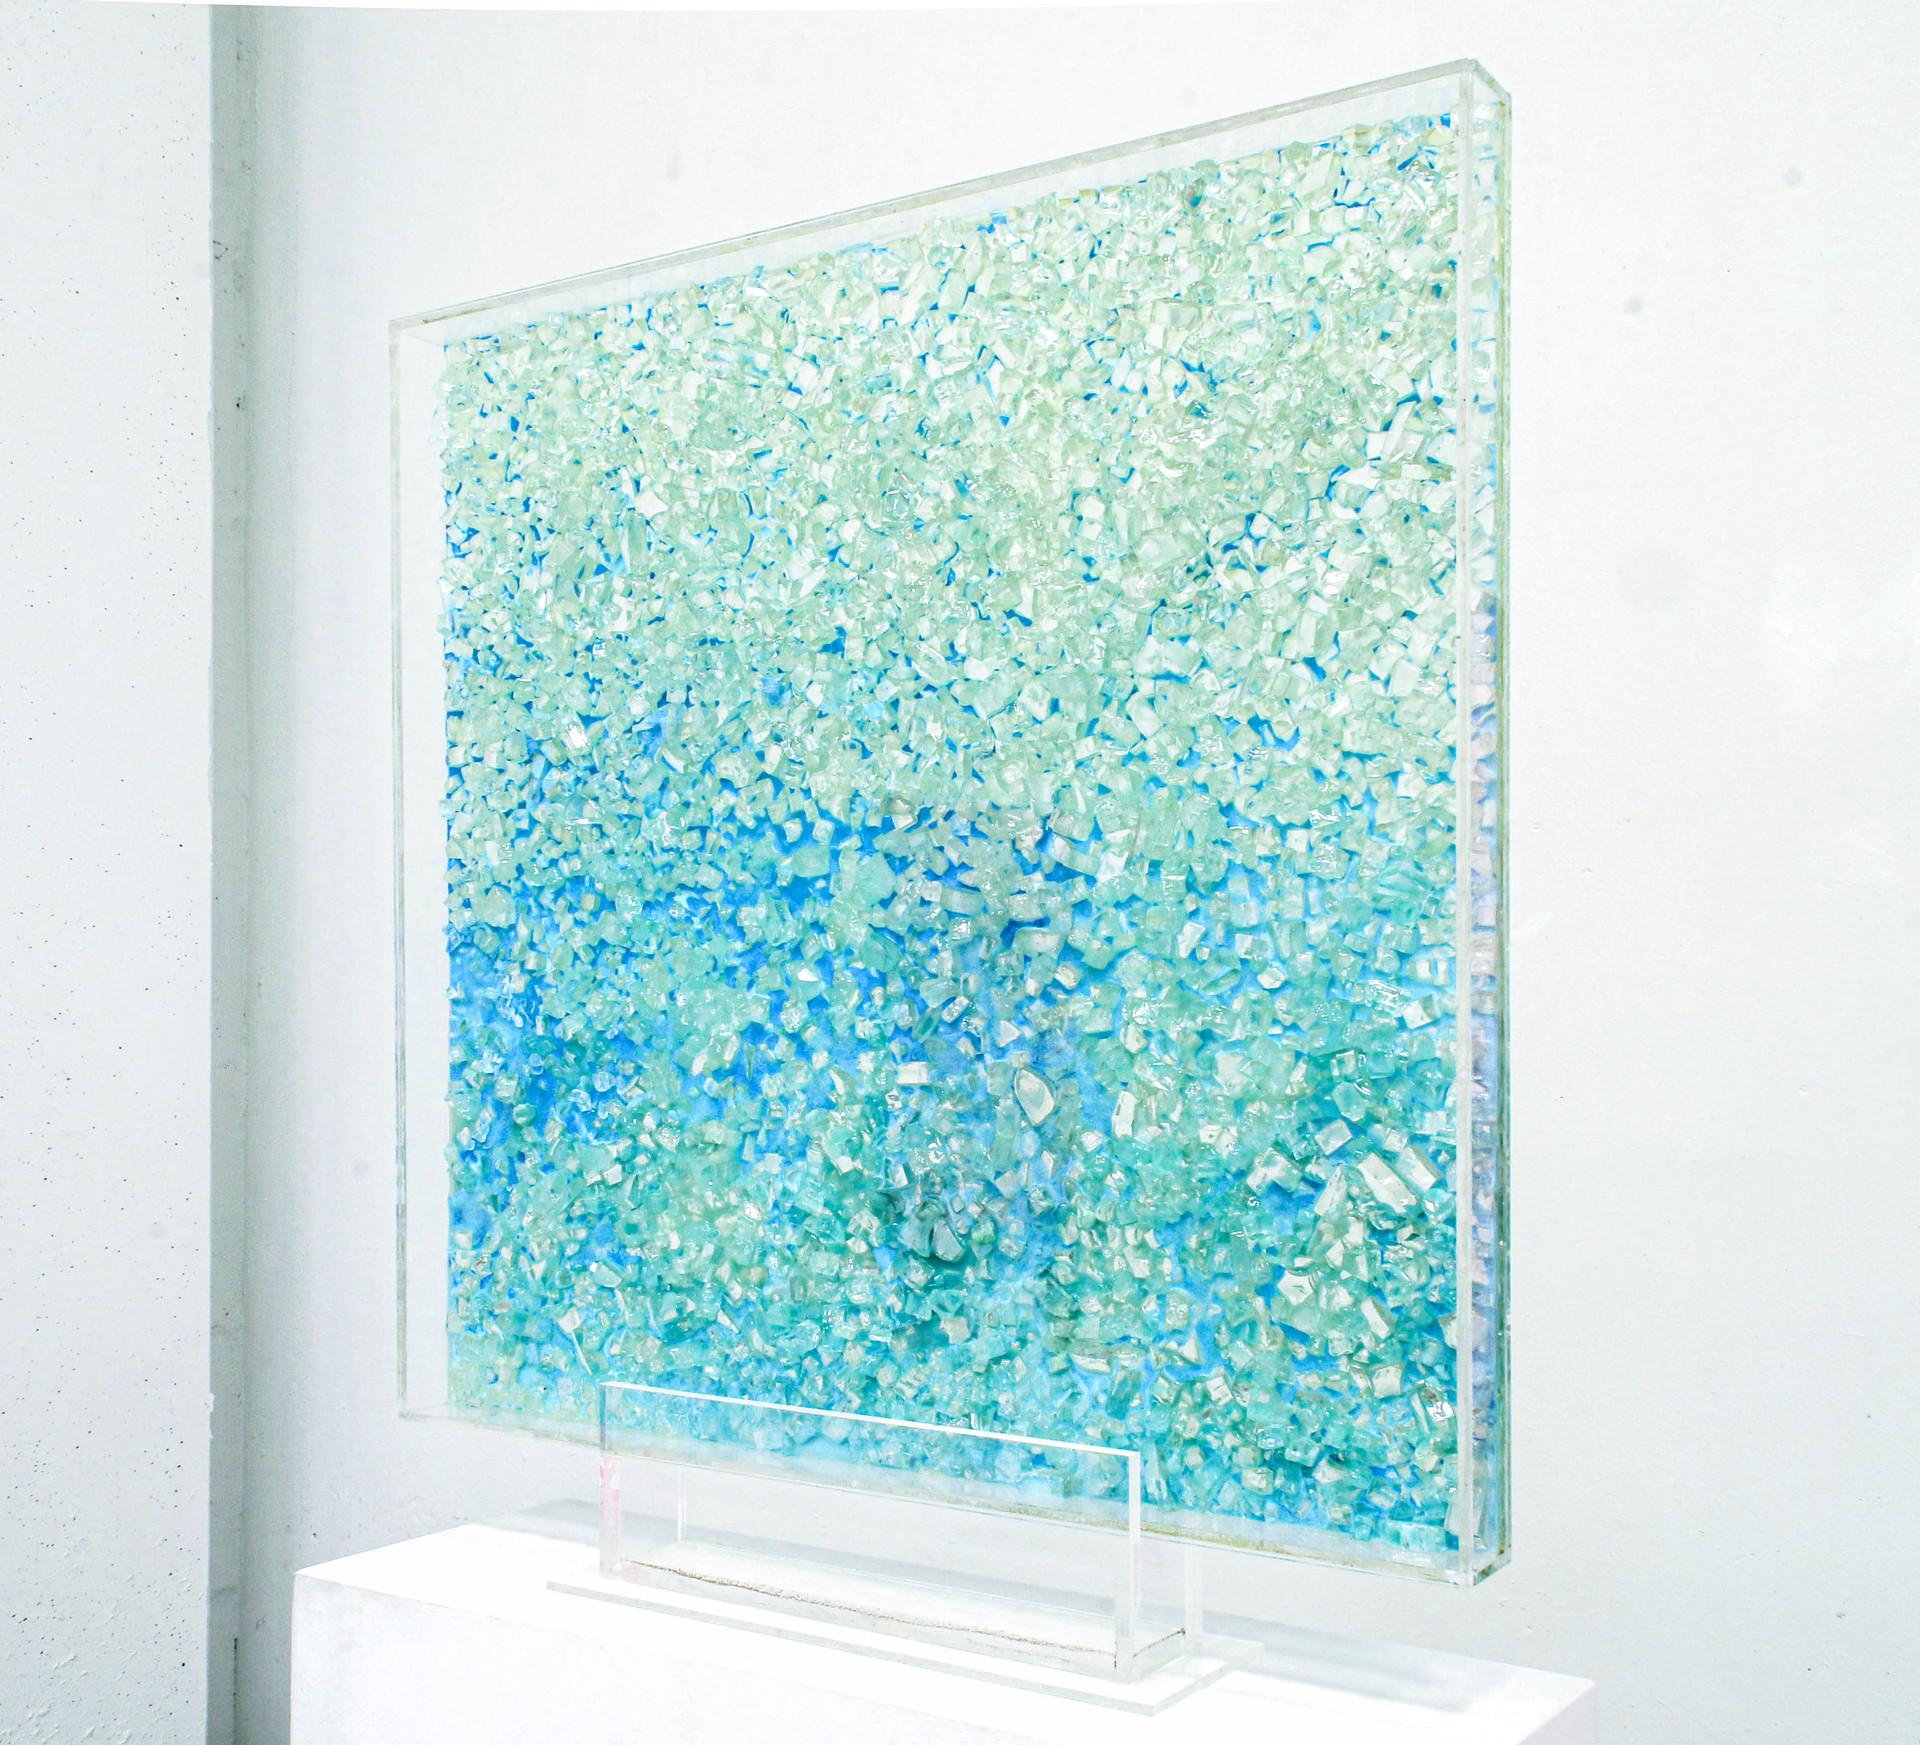 ICE CRUSH Acrylic paint, canvas, glass, resin 50x50x6cm AVAILABLE